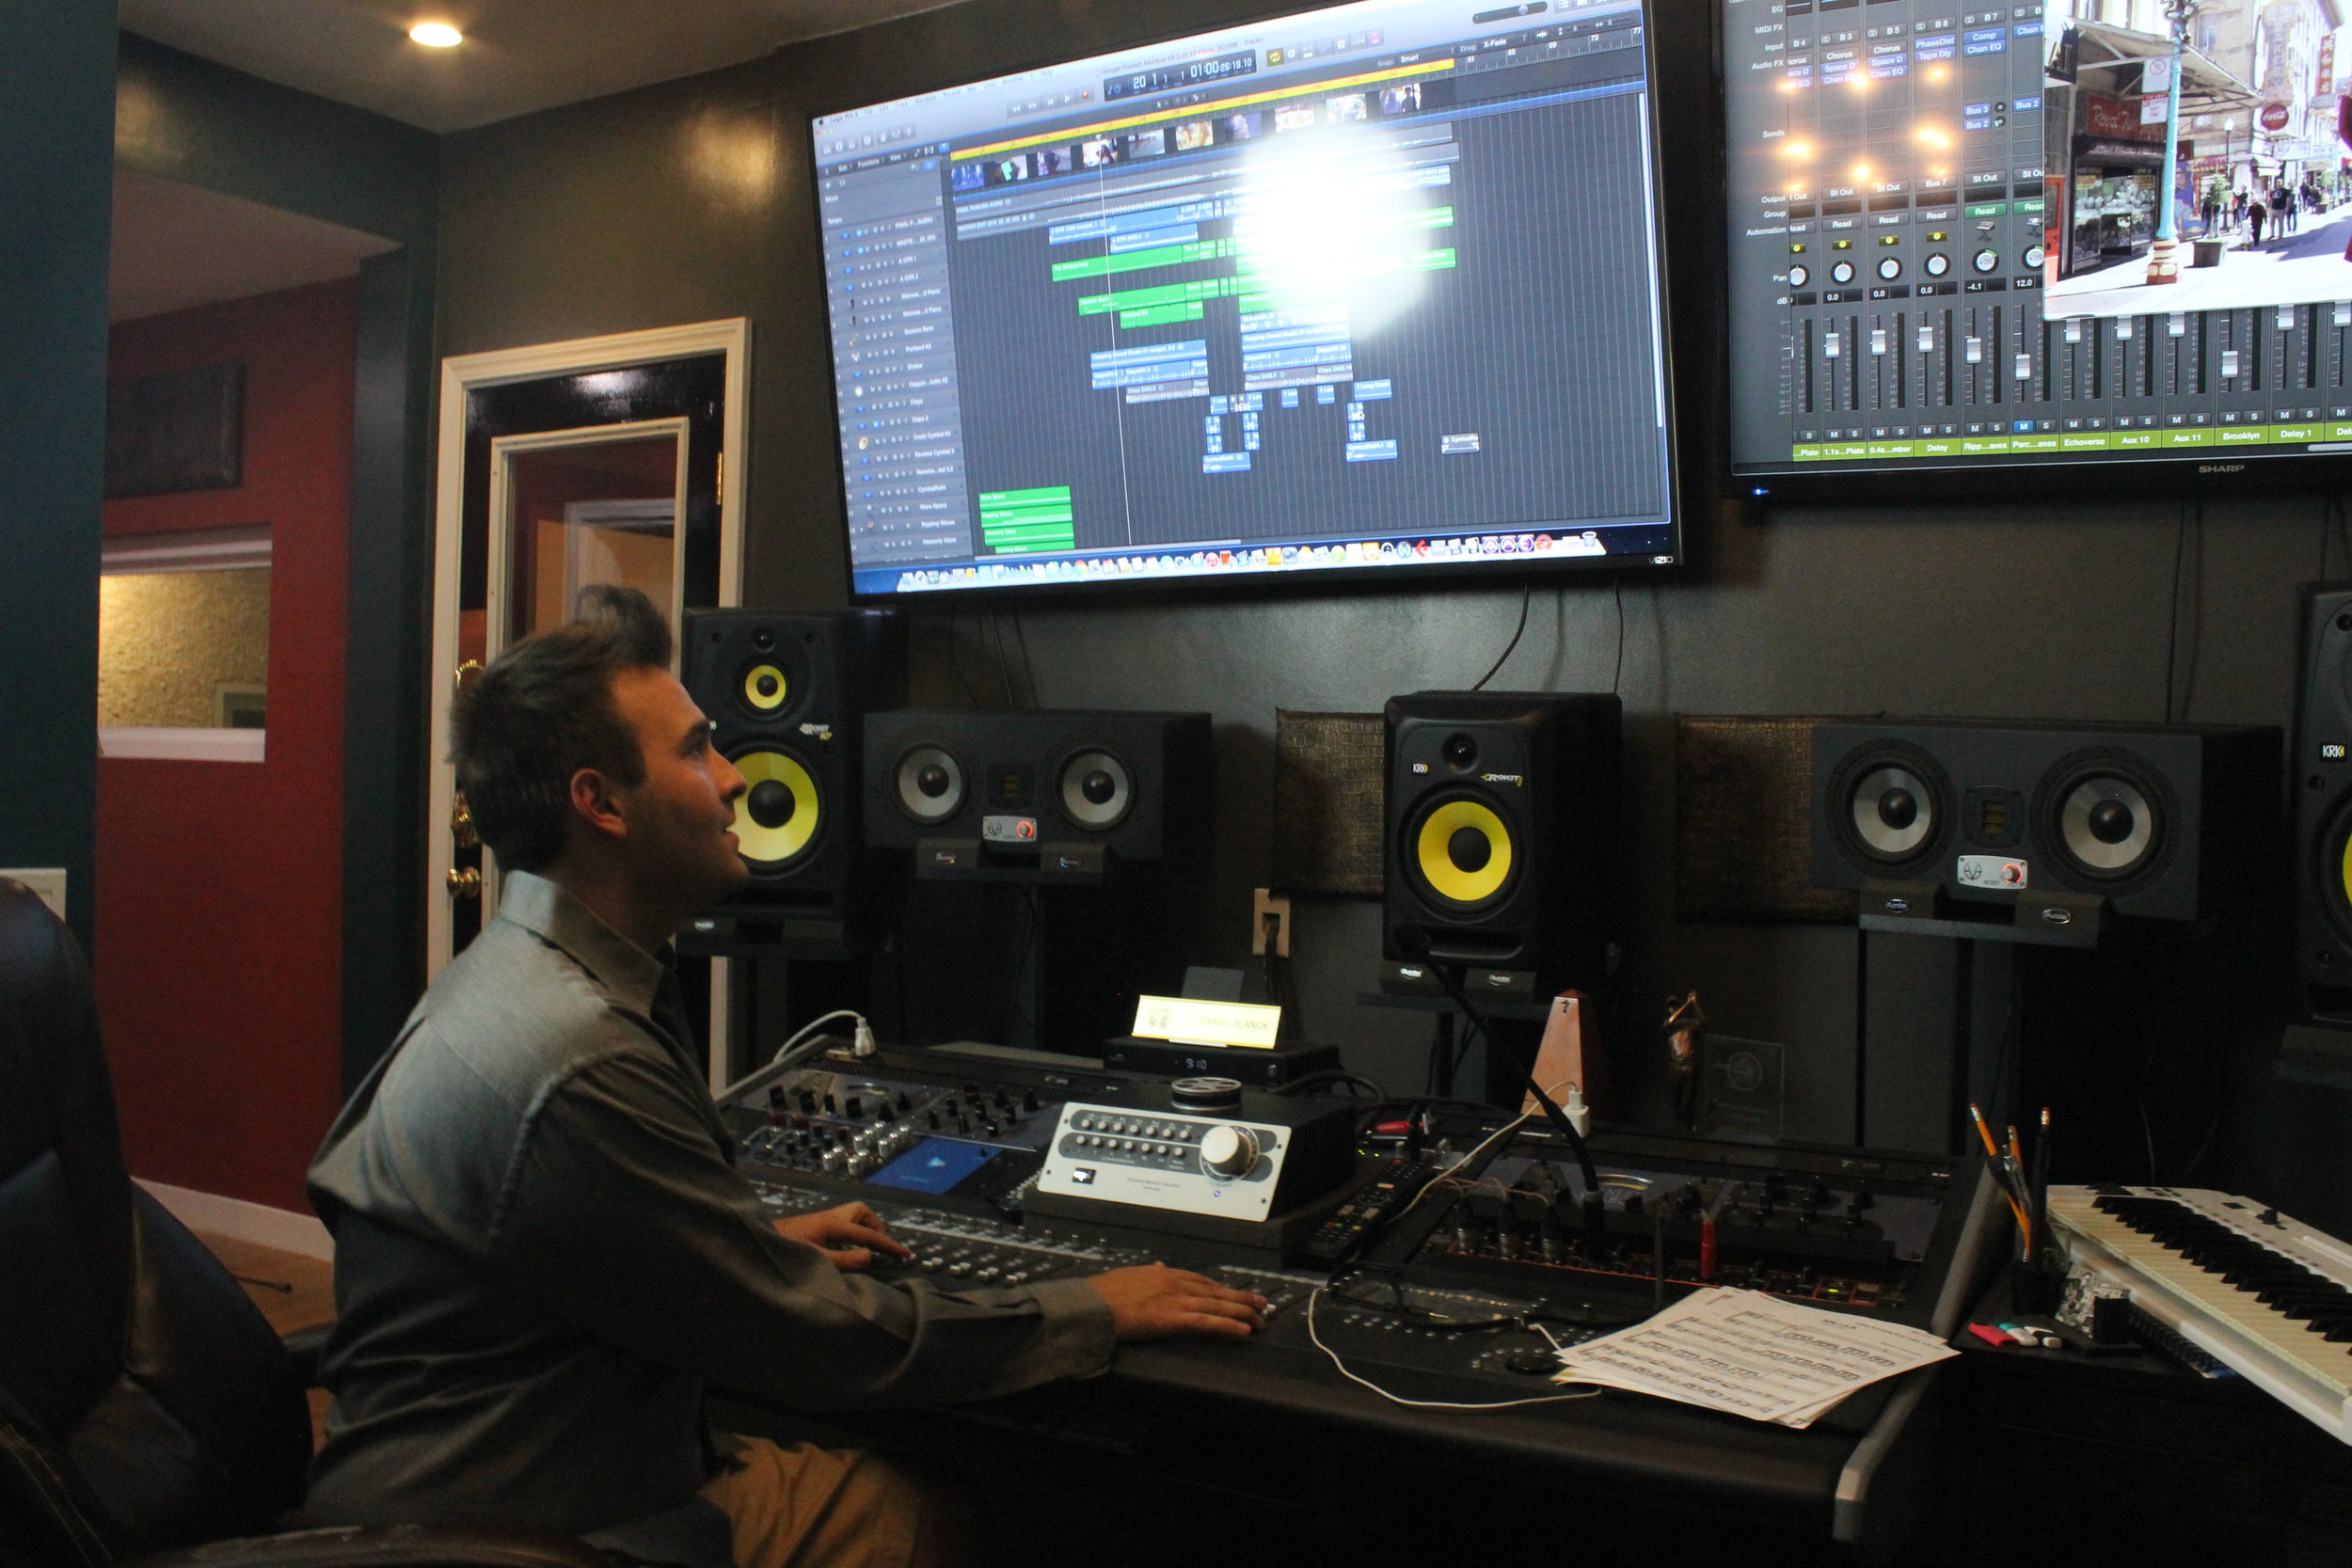 Blanck Records Dan Blanck Control Room.JPG